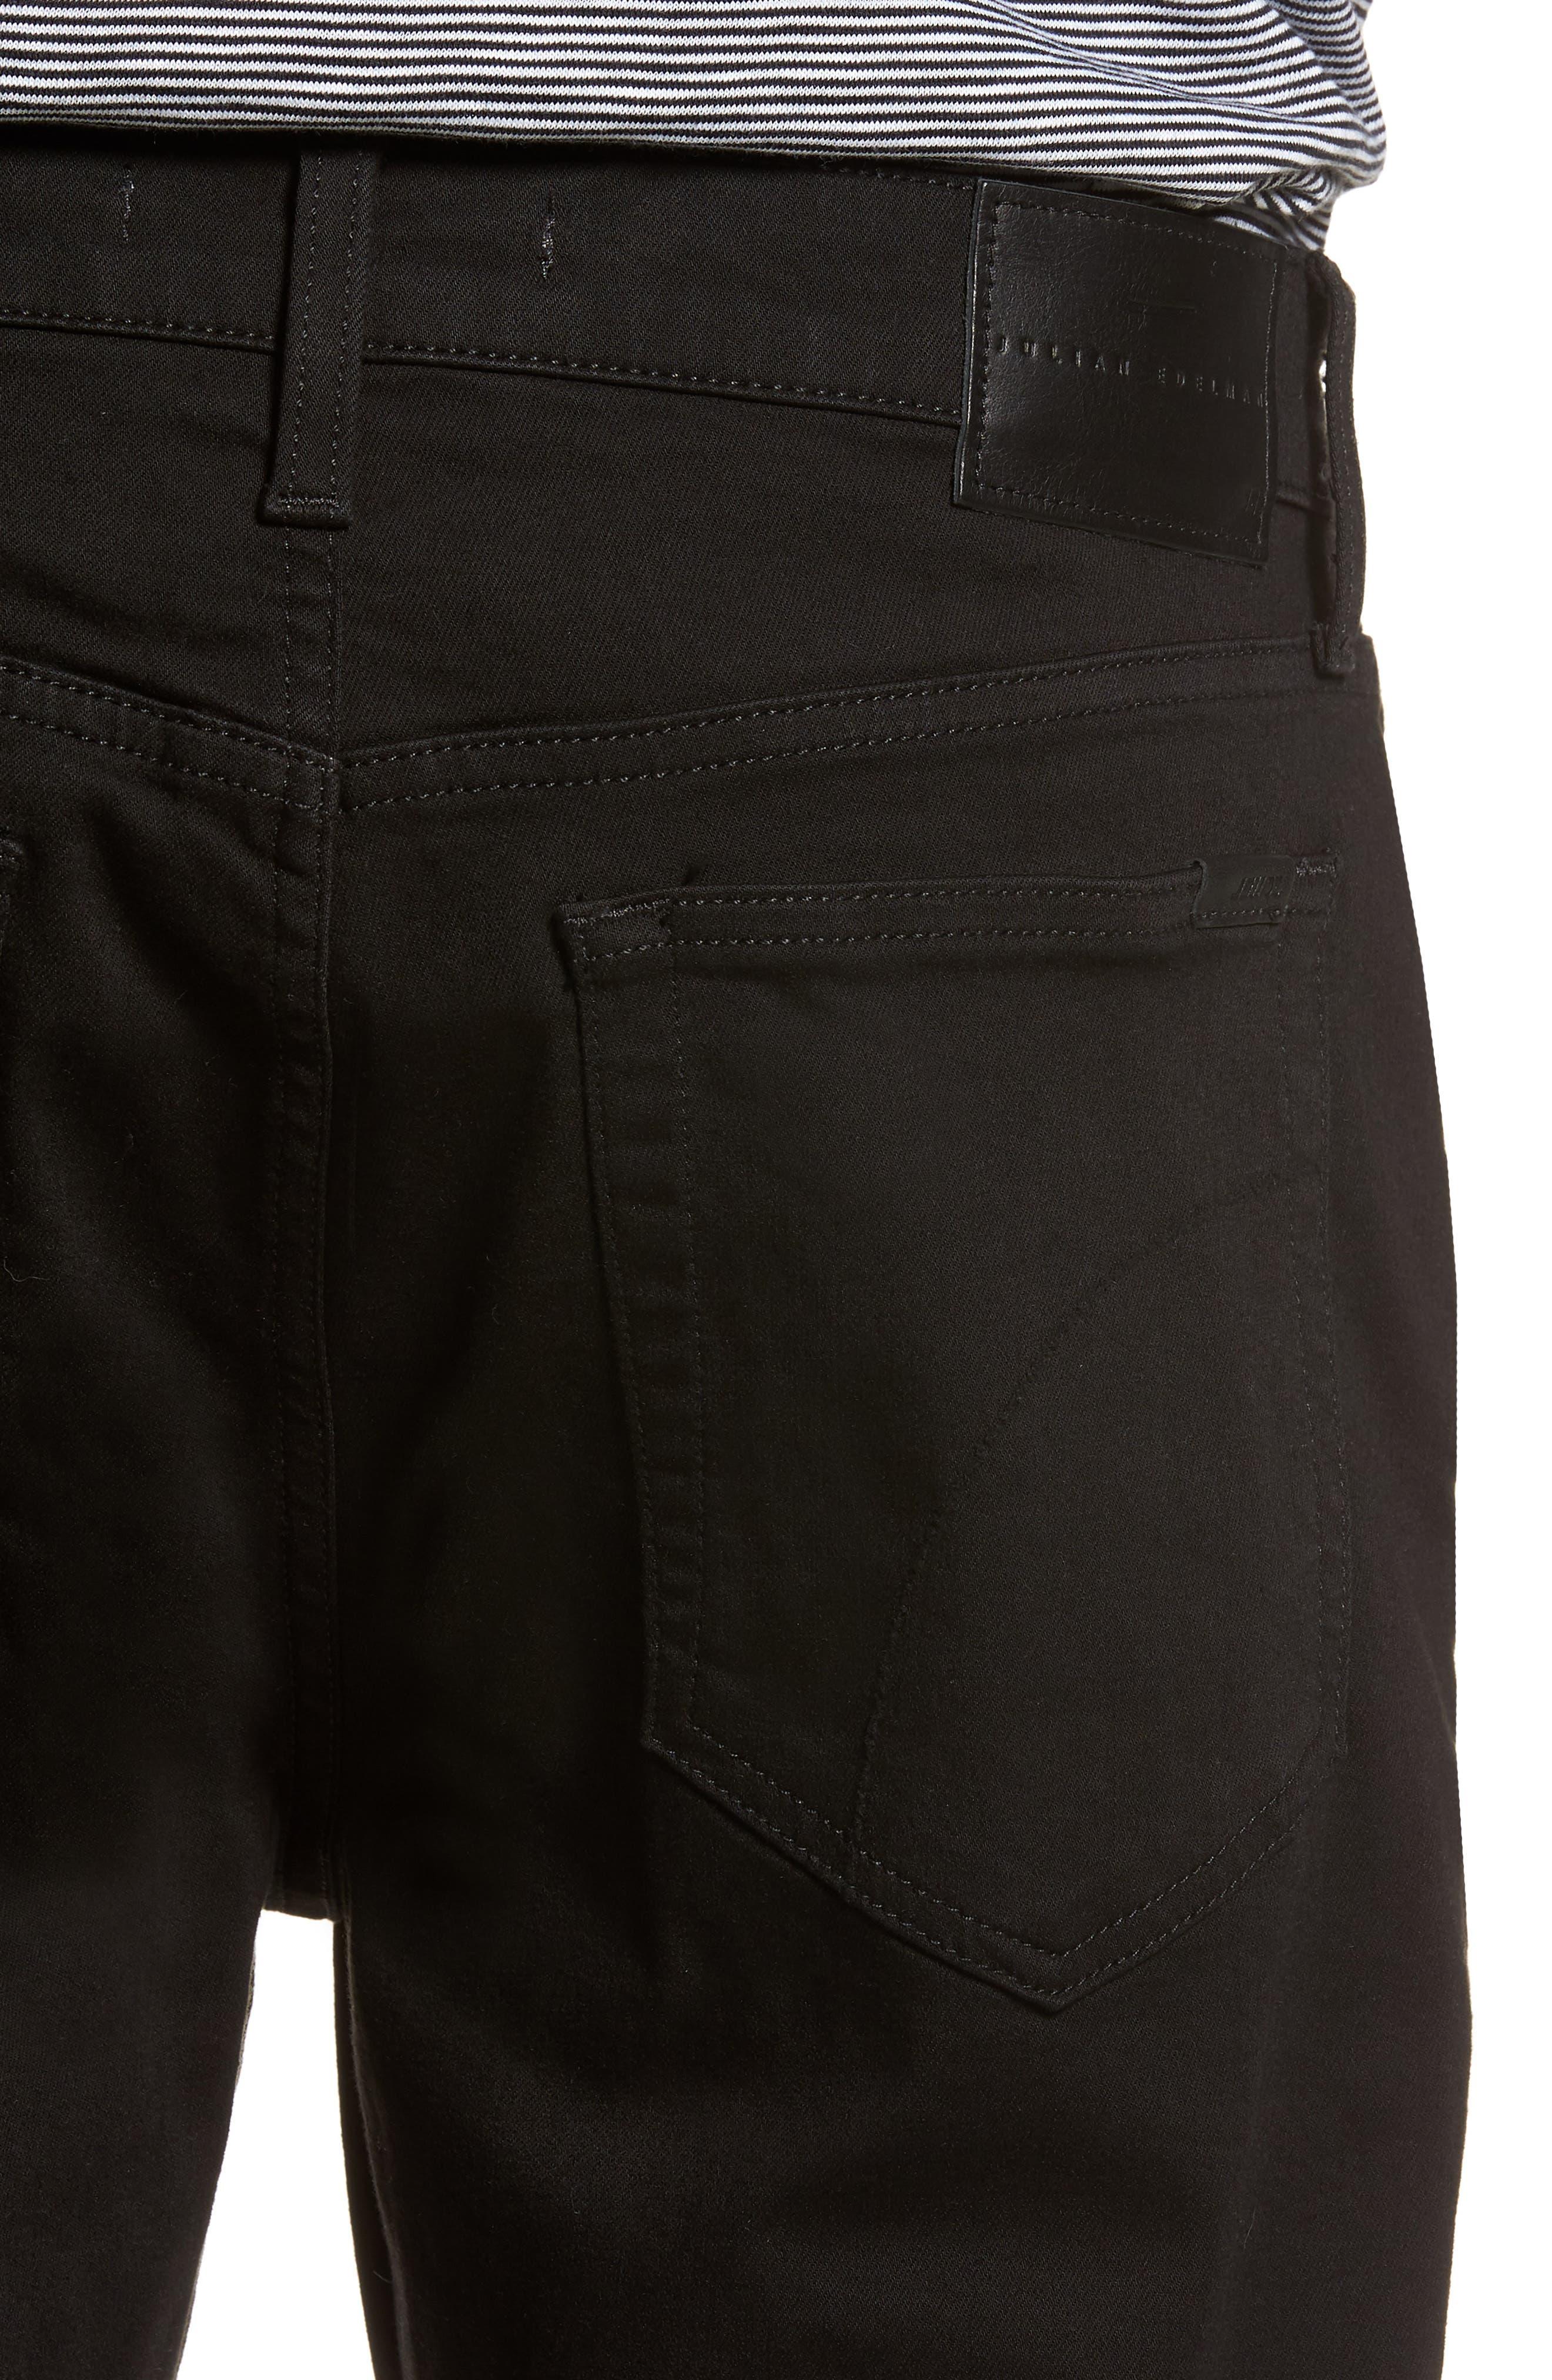 Folsom Athletic Slim Fit Jeans,                             Alternate thumbnail 4, color,                             Edleman